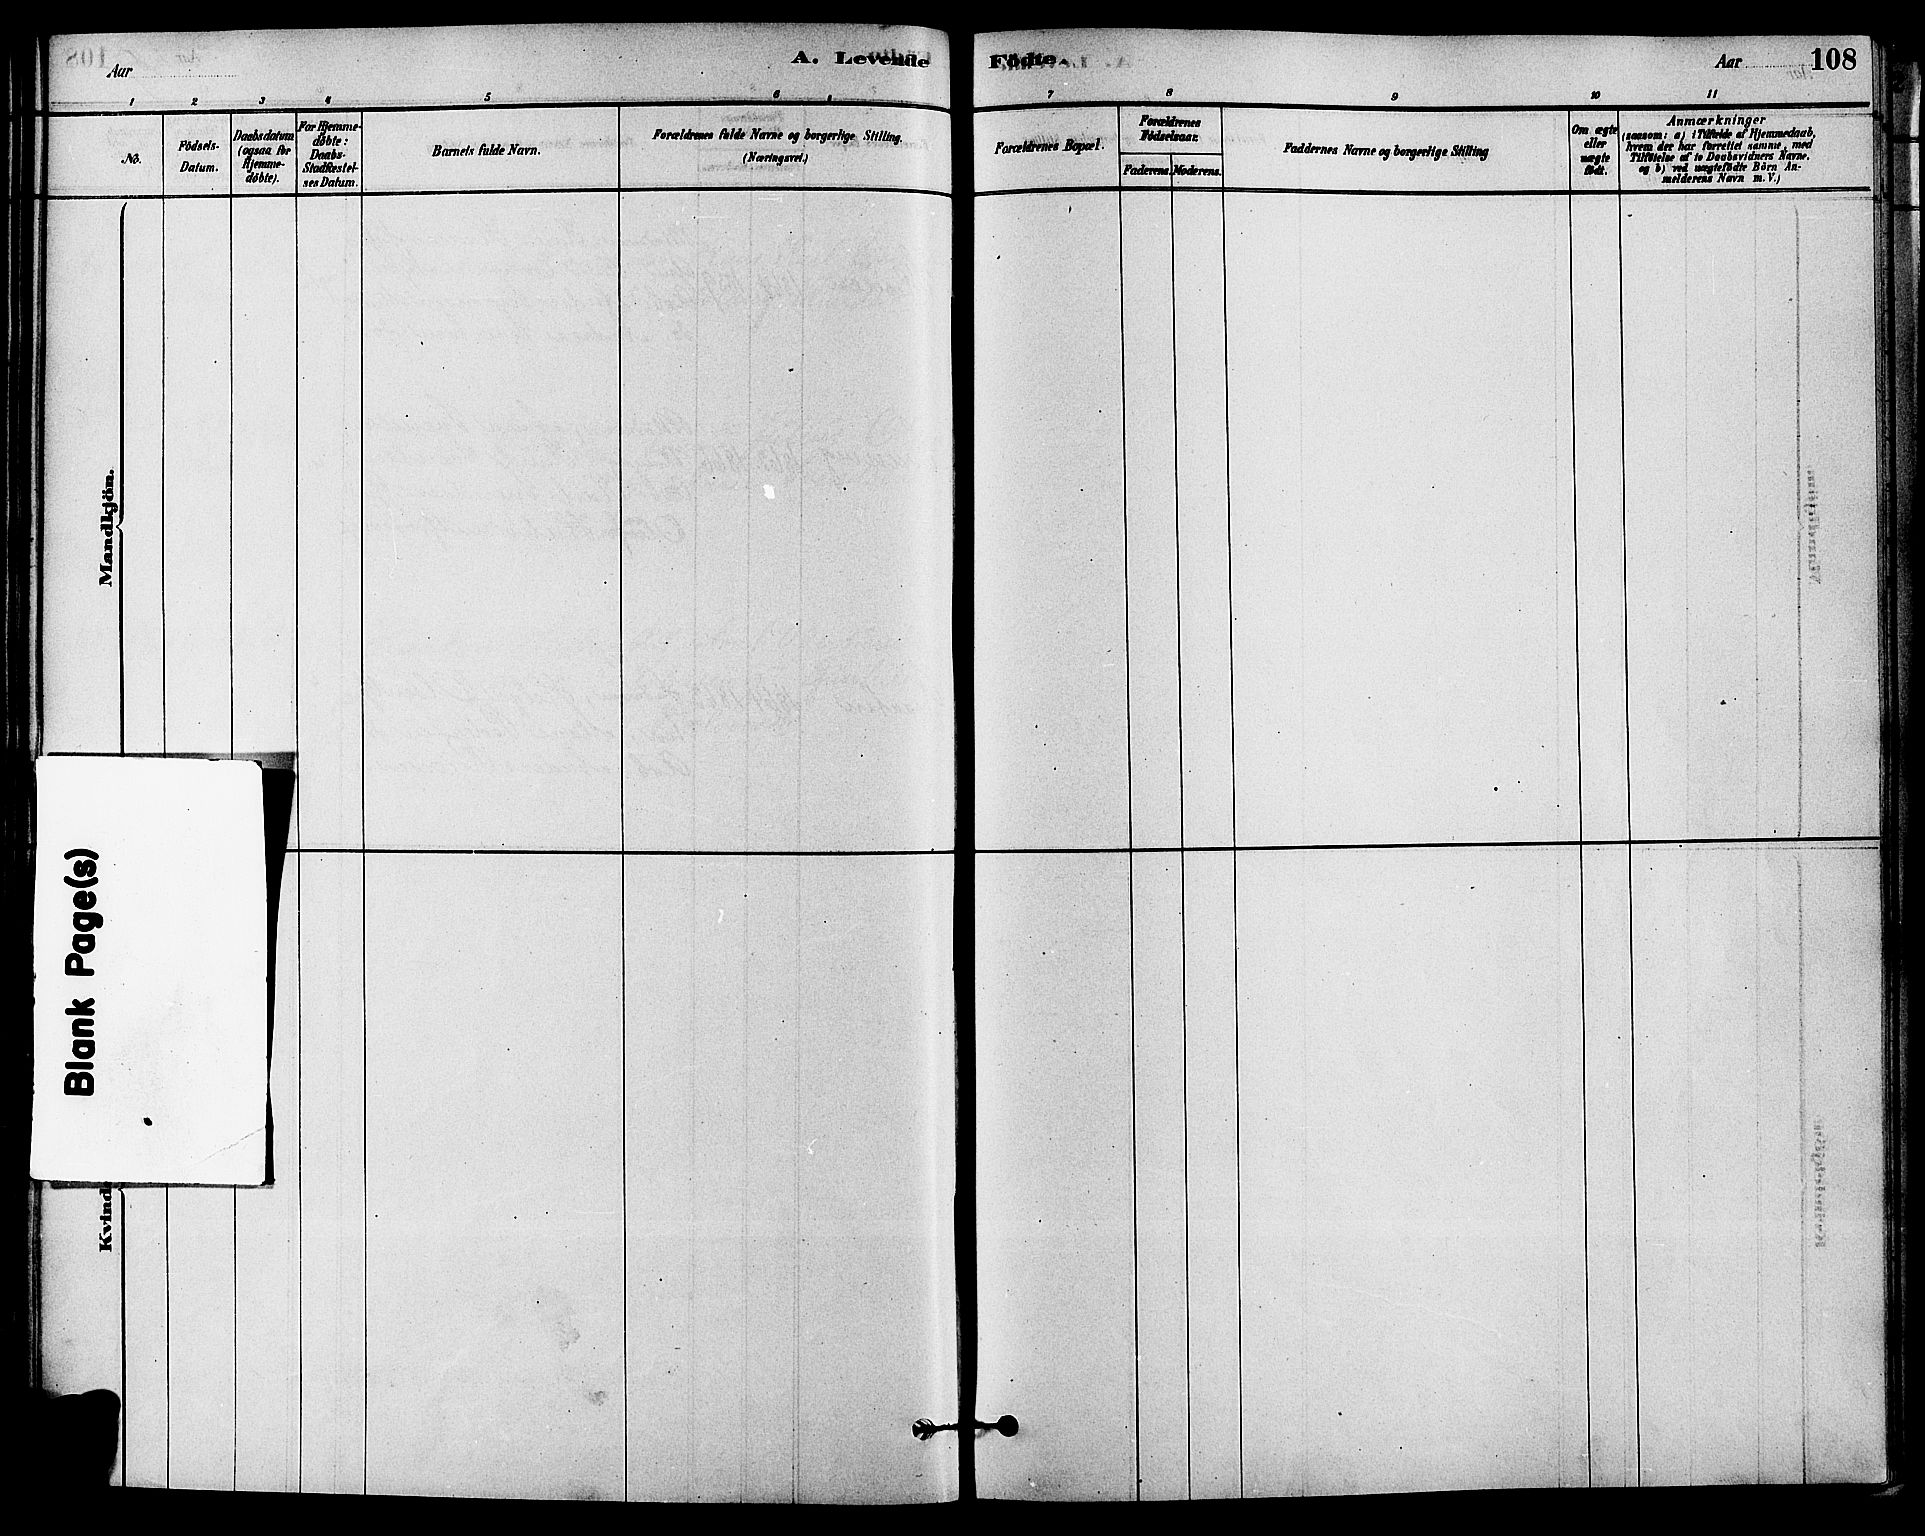 SAKO, Solum kirkebøker, F/Fa/L0009: Ministerialbok nr. I 9, 1877-1887, s. 108